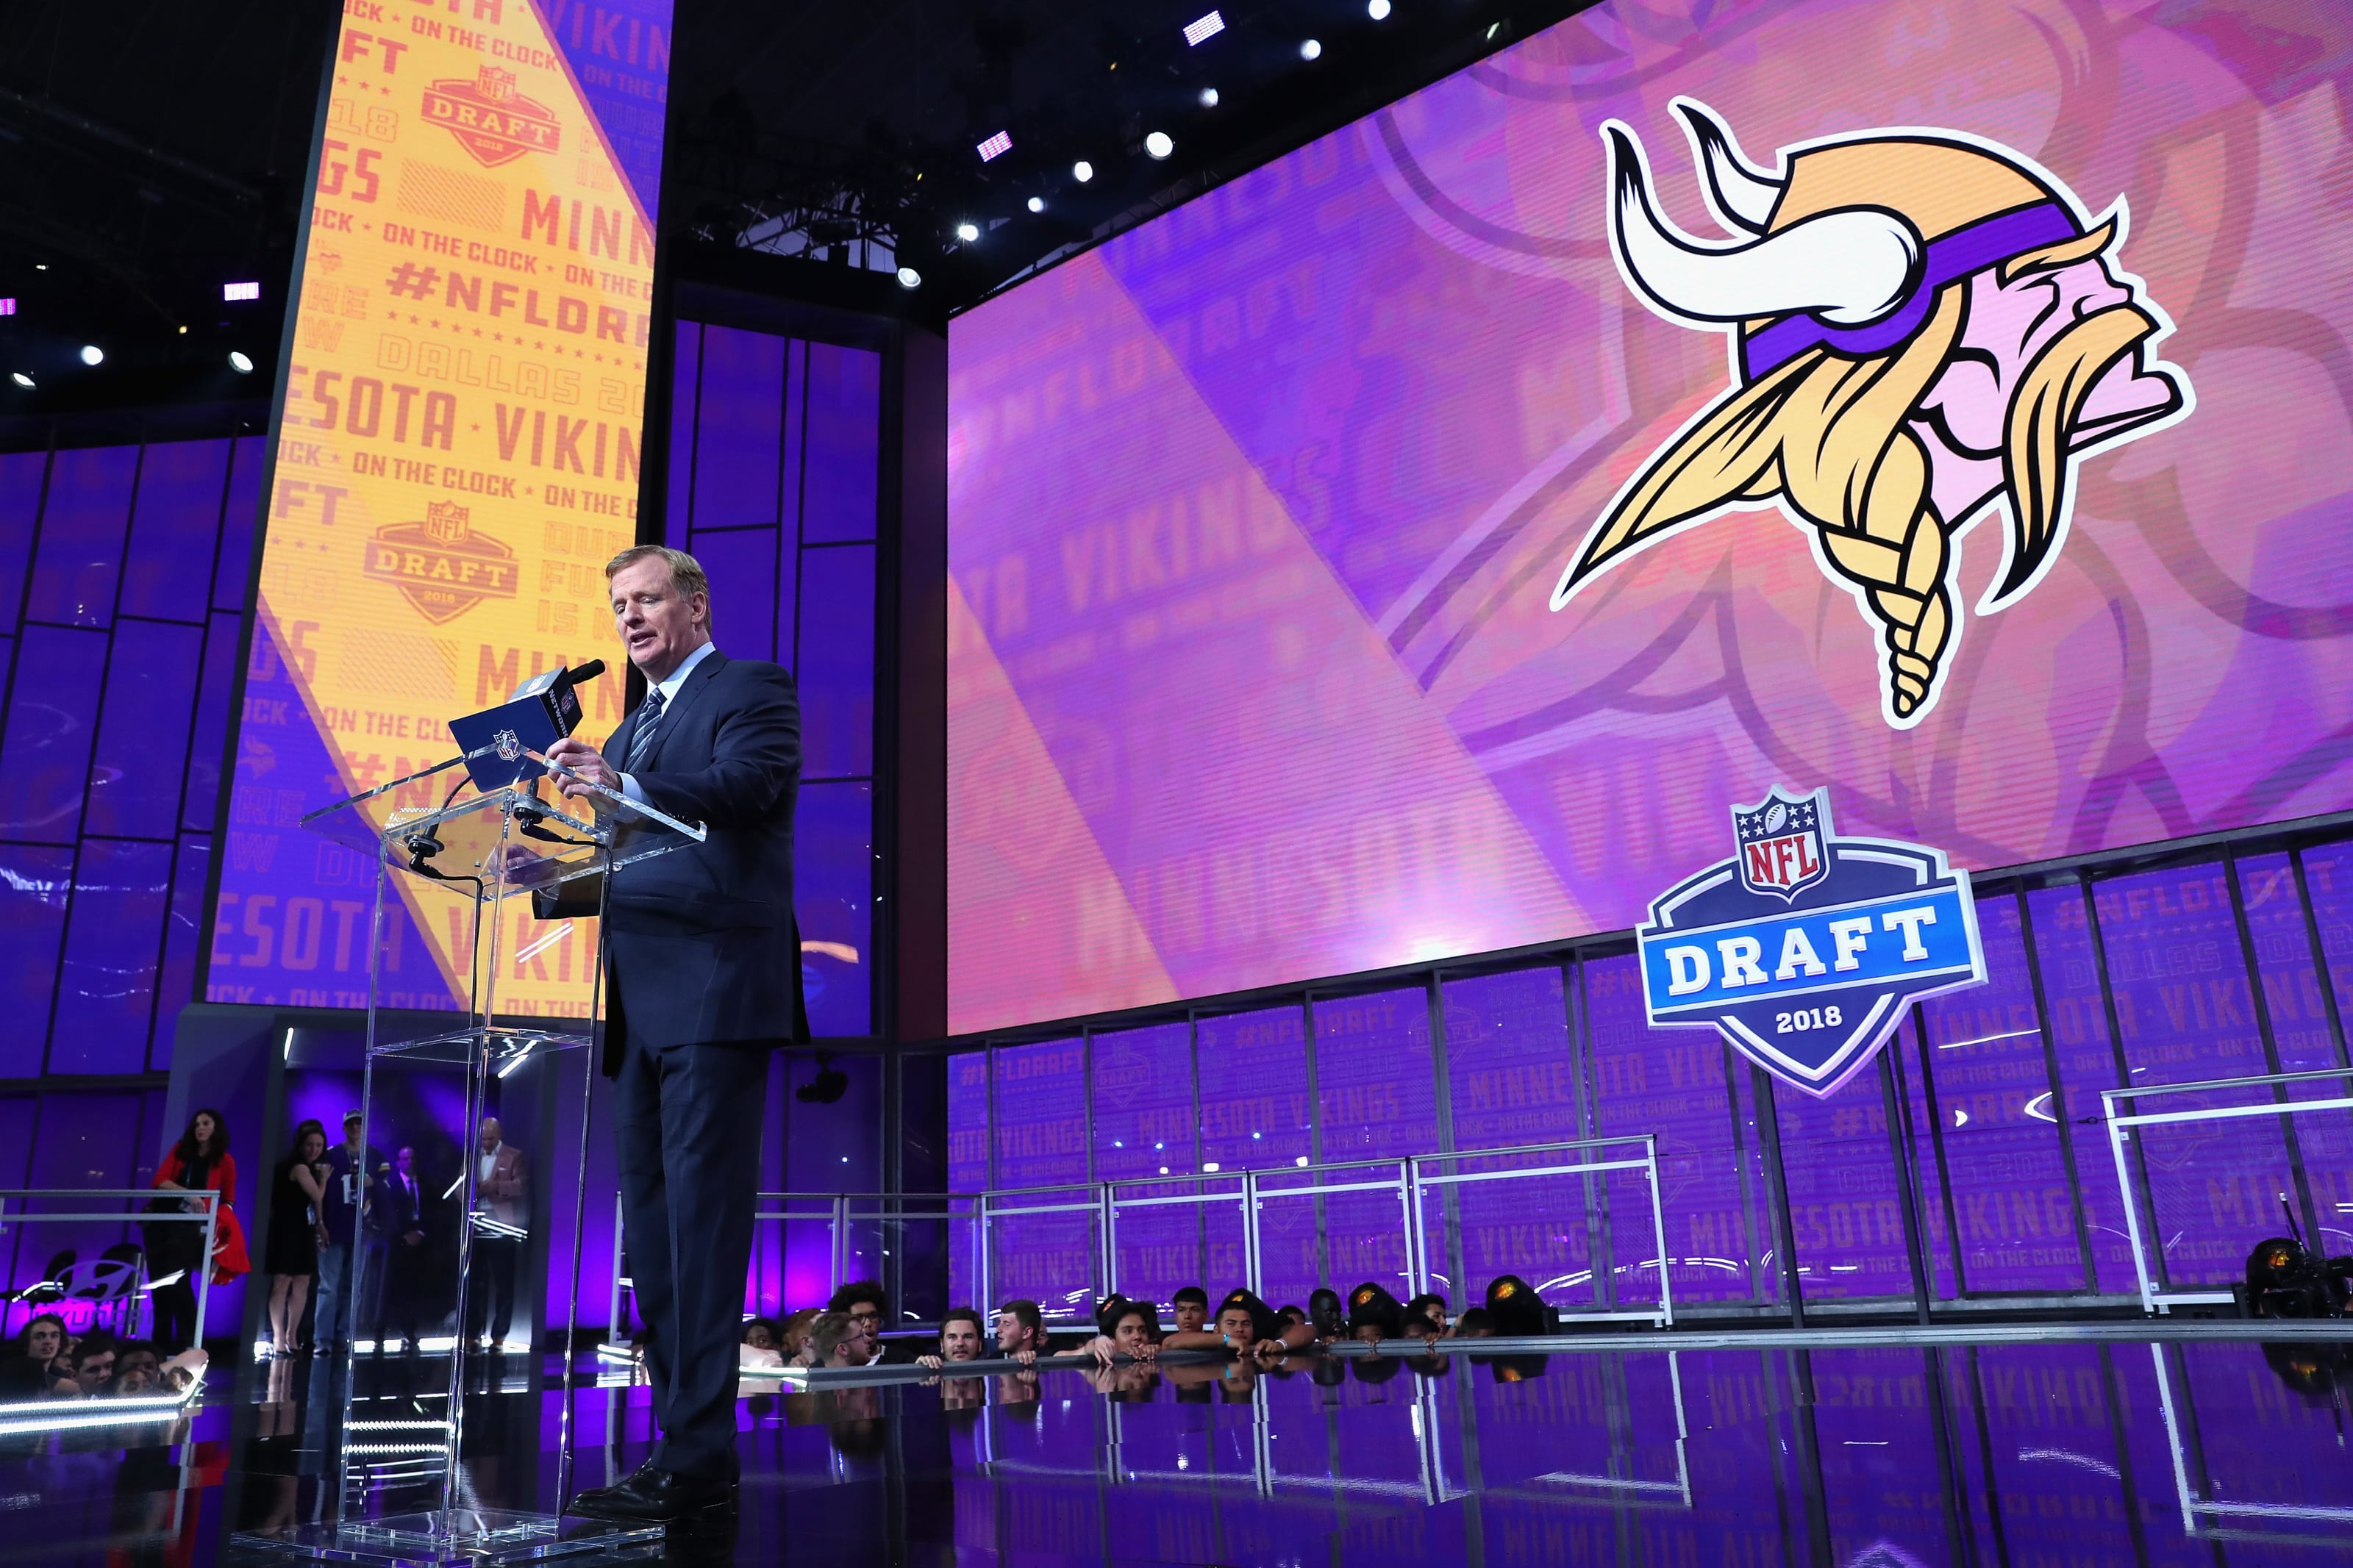 Minnesota Vikings on the clock (Photo by Tom Pennington/Getty Images)